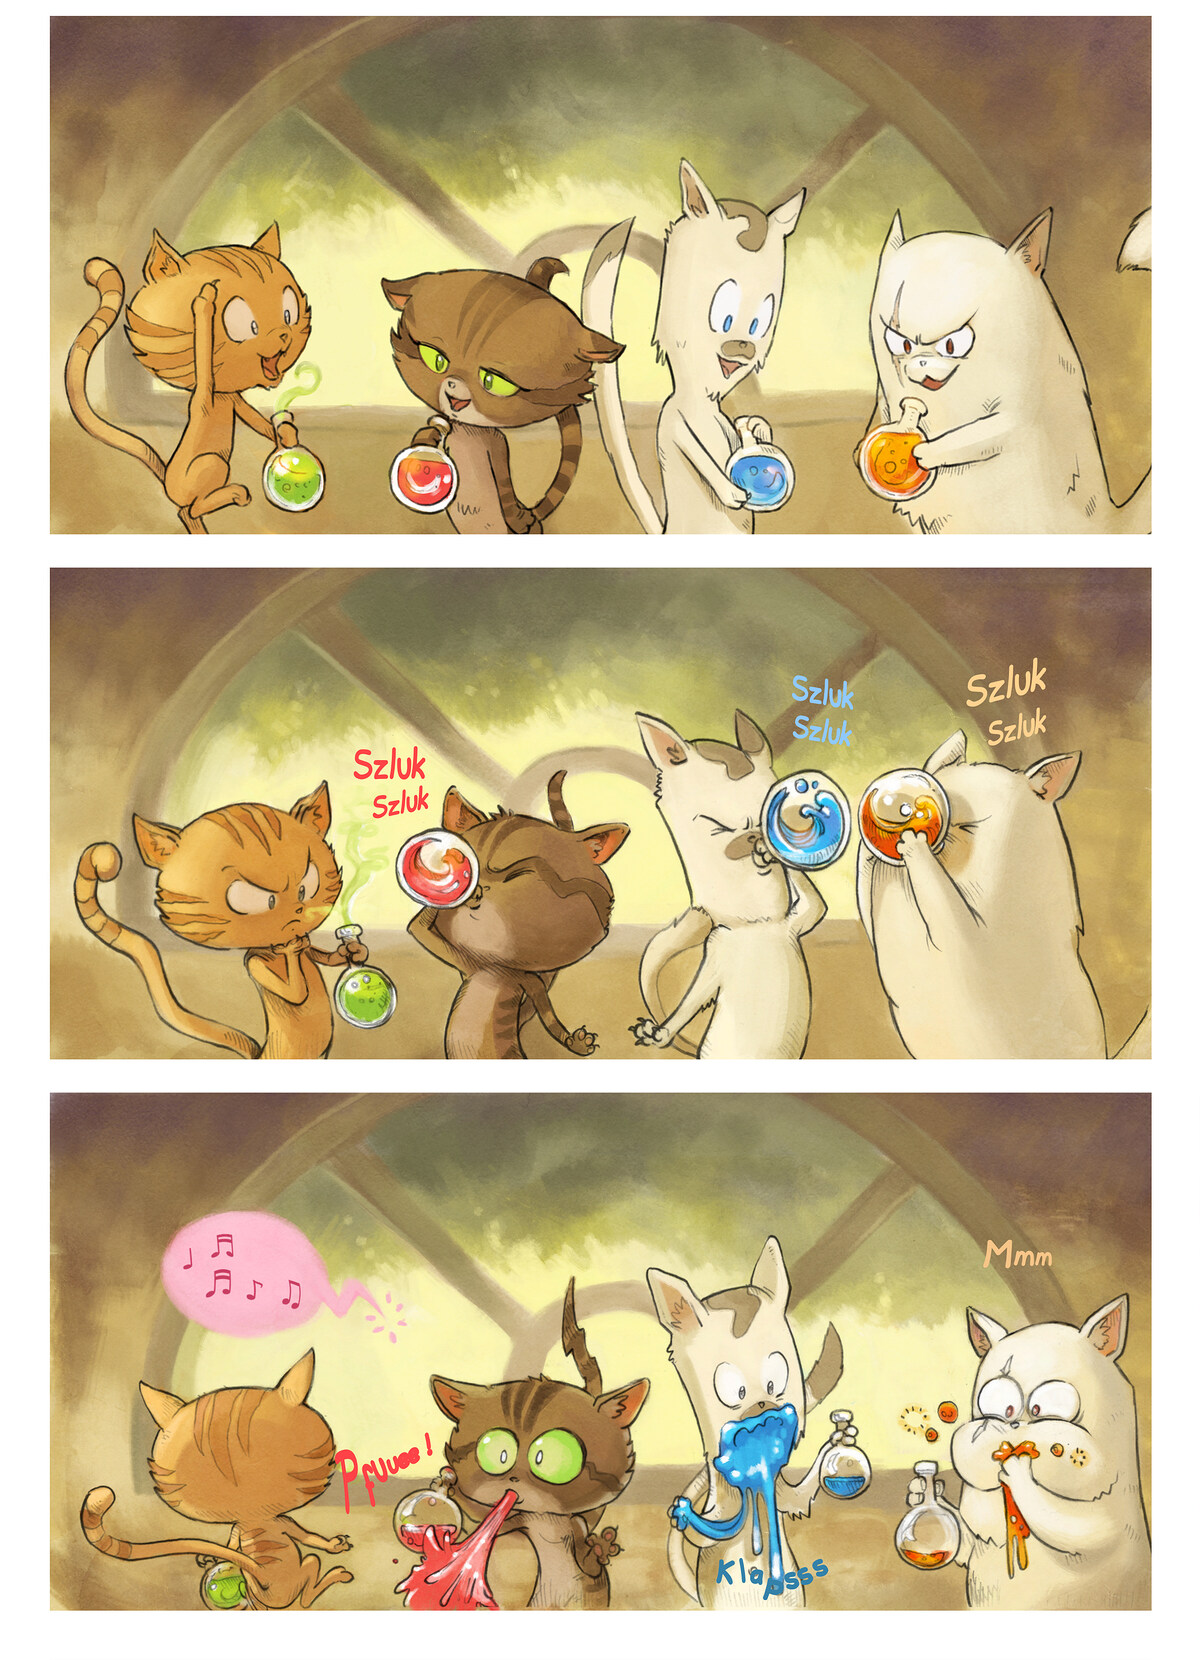 A webcomic page of Pepper&Carrot, tajla 2 [sz], strōna 4